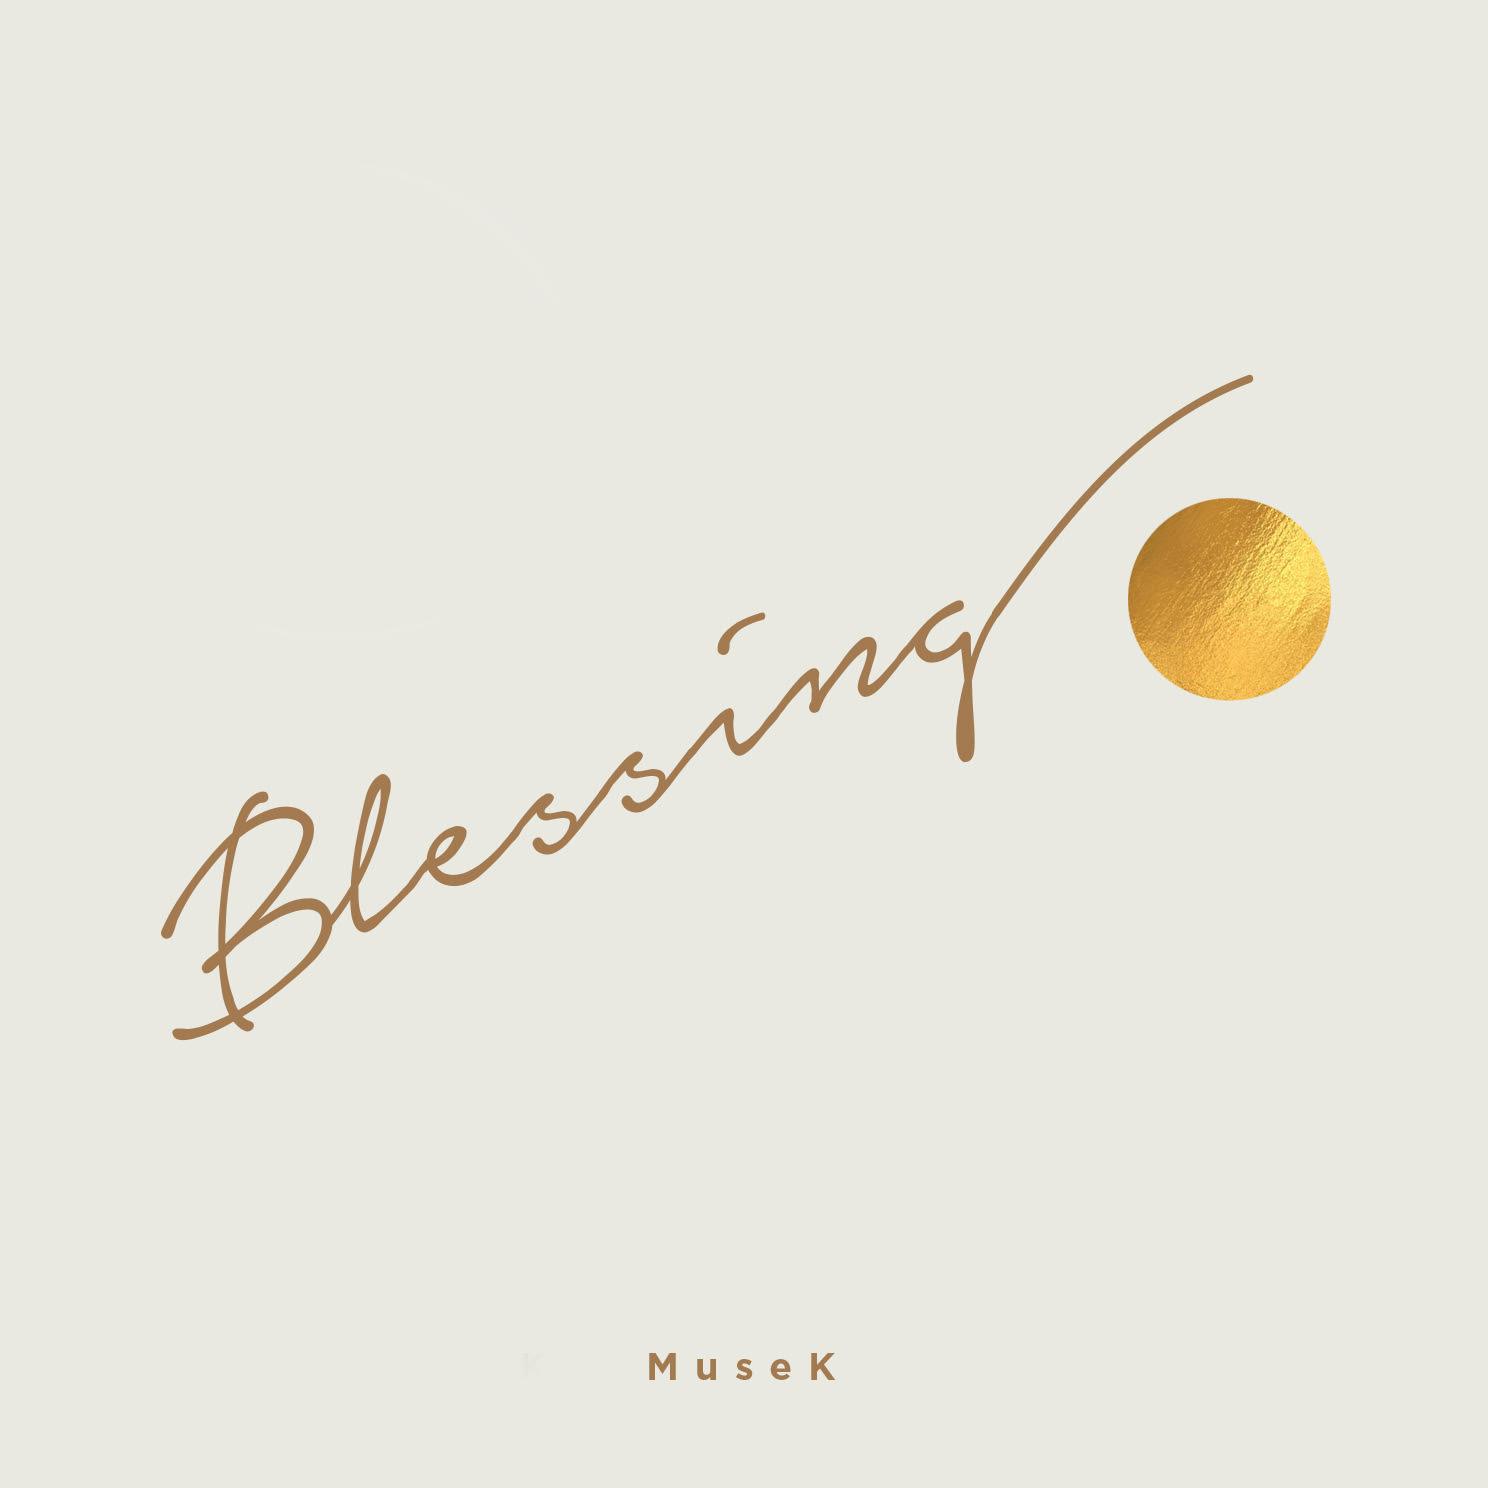 Blessing_MuseK